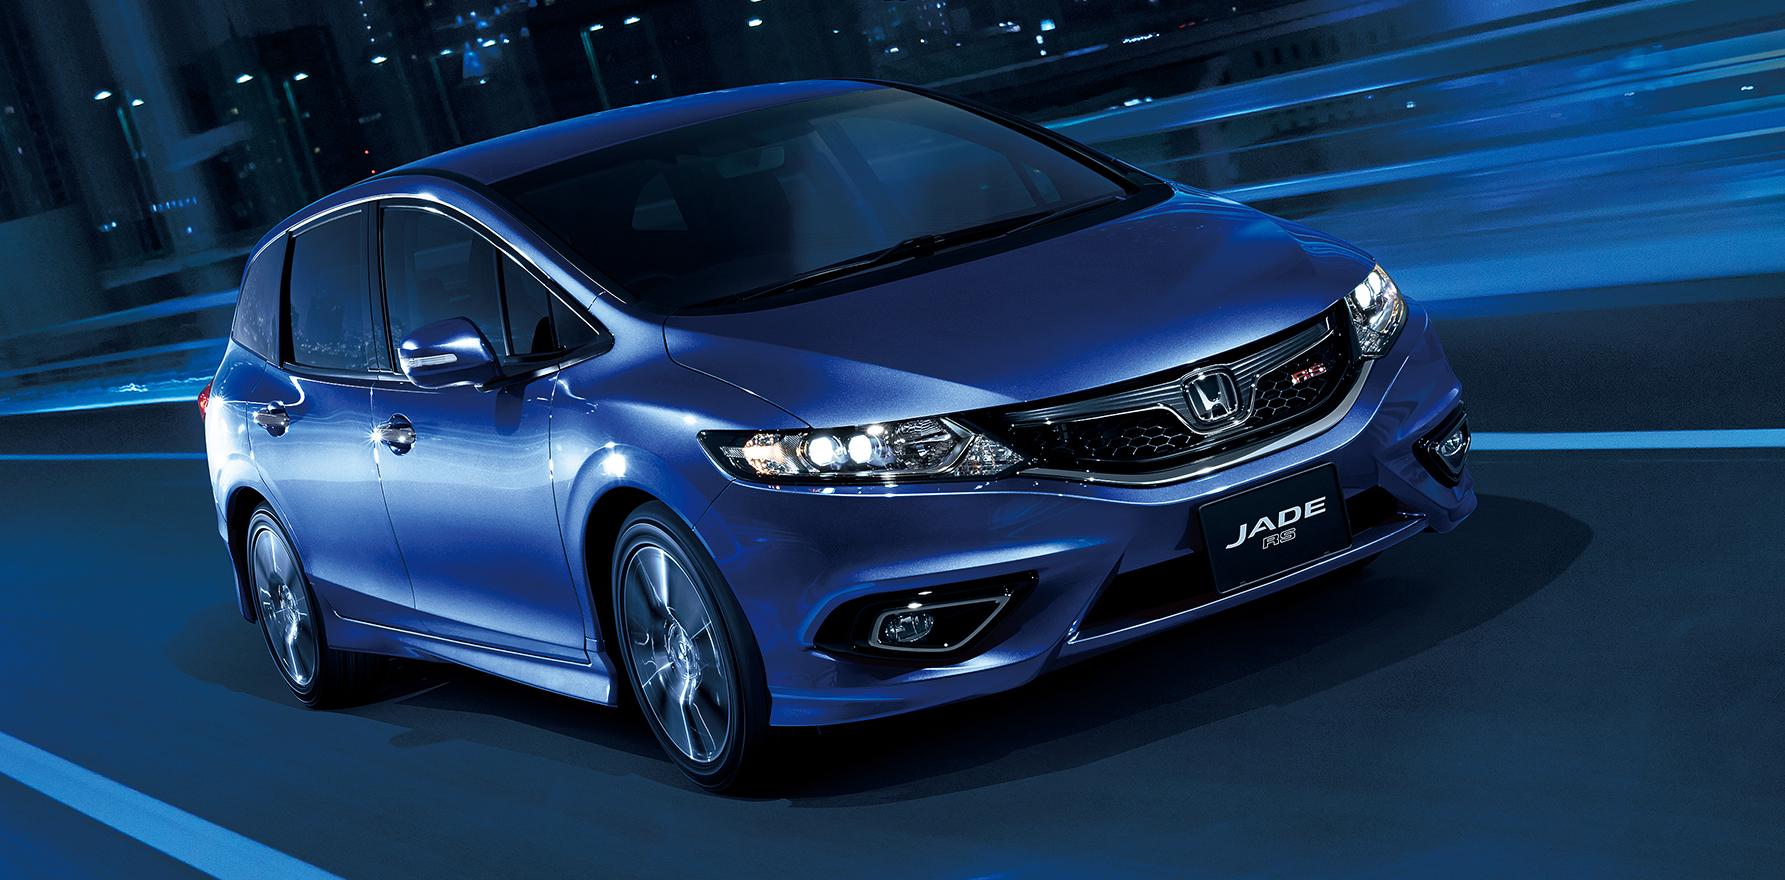 Honda Jade Rs Debuts With New Vtec Turbo Engine Image 341556